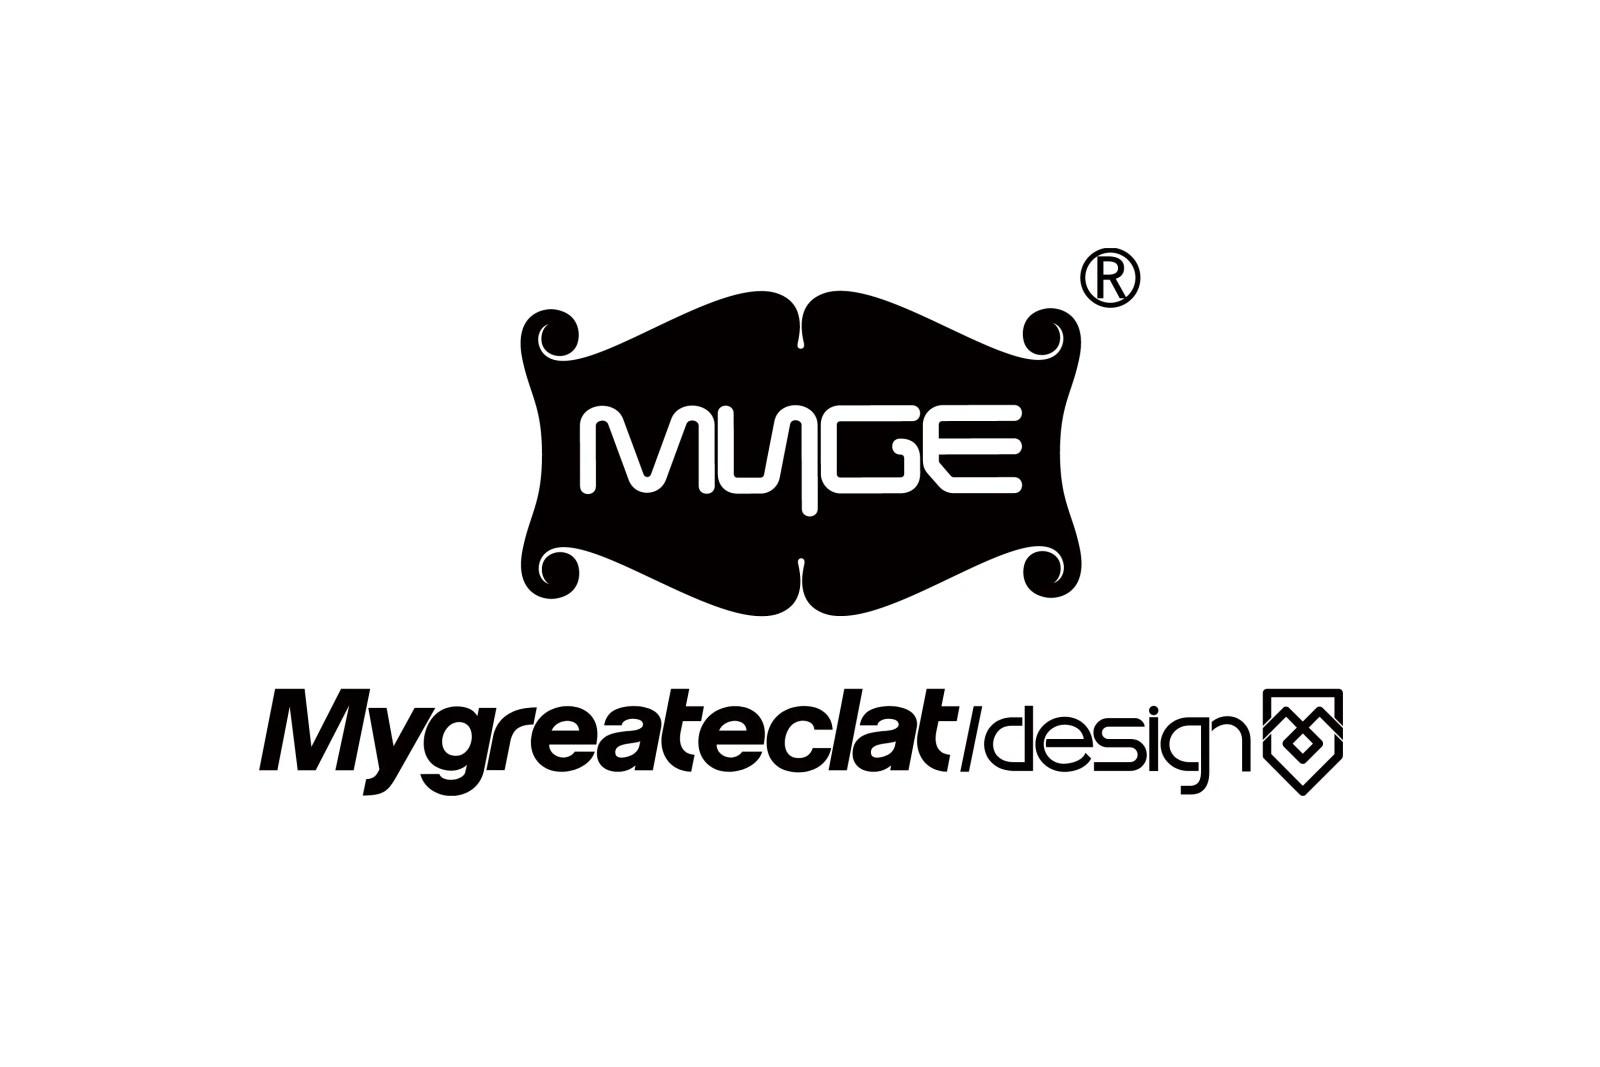 HYPEBEAST 專訪多位業內人士探討品牌 Logo 背後的價值與商業性 | HYPEBEAST